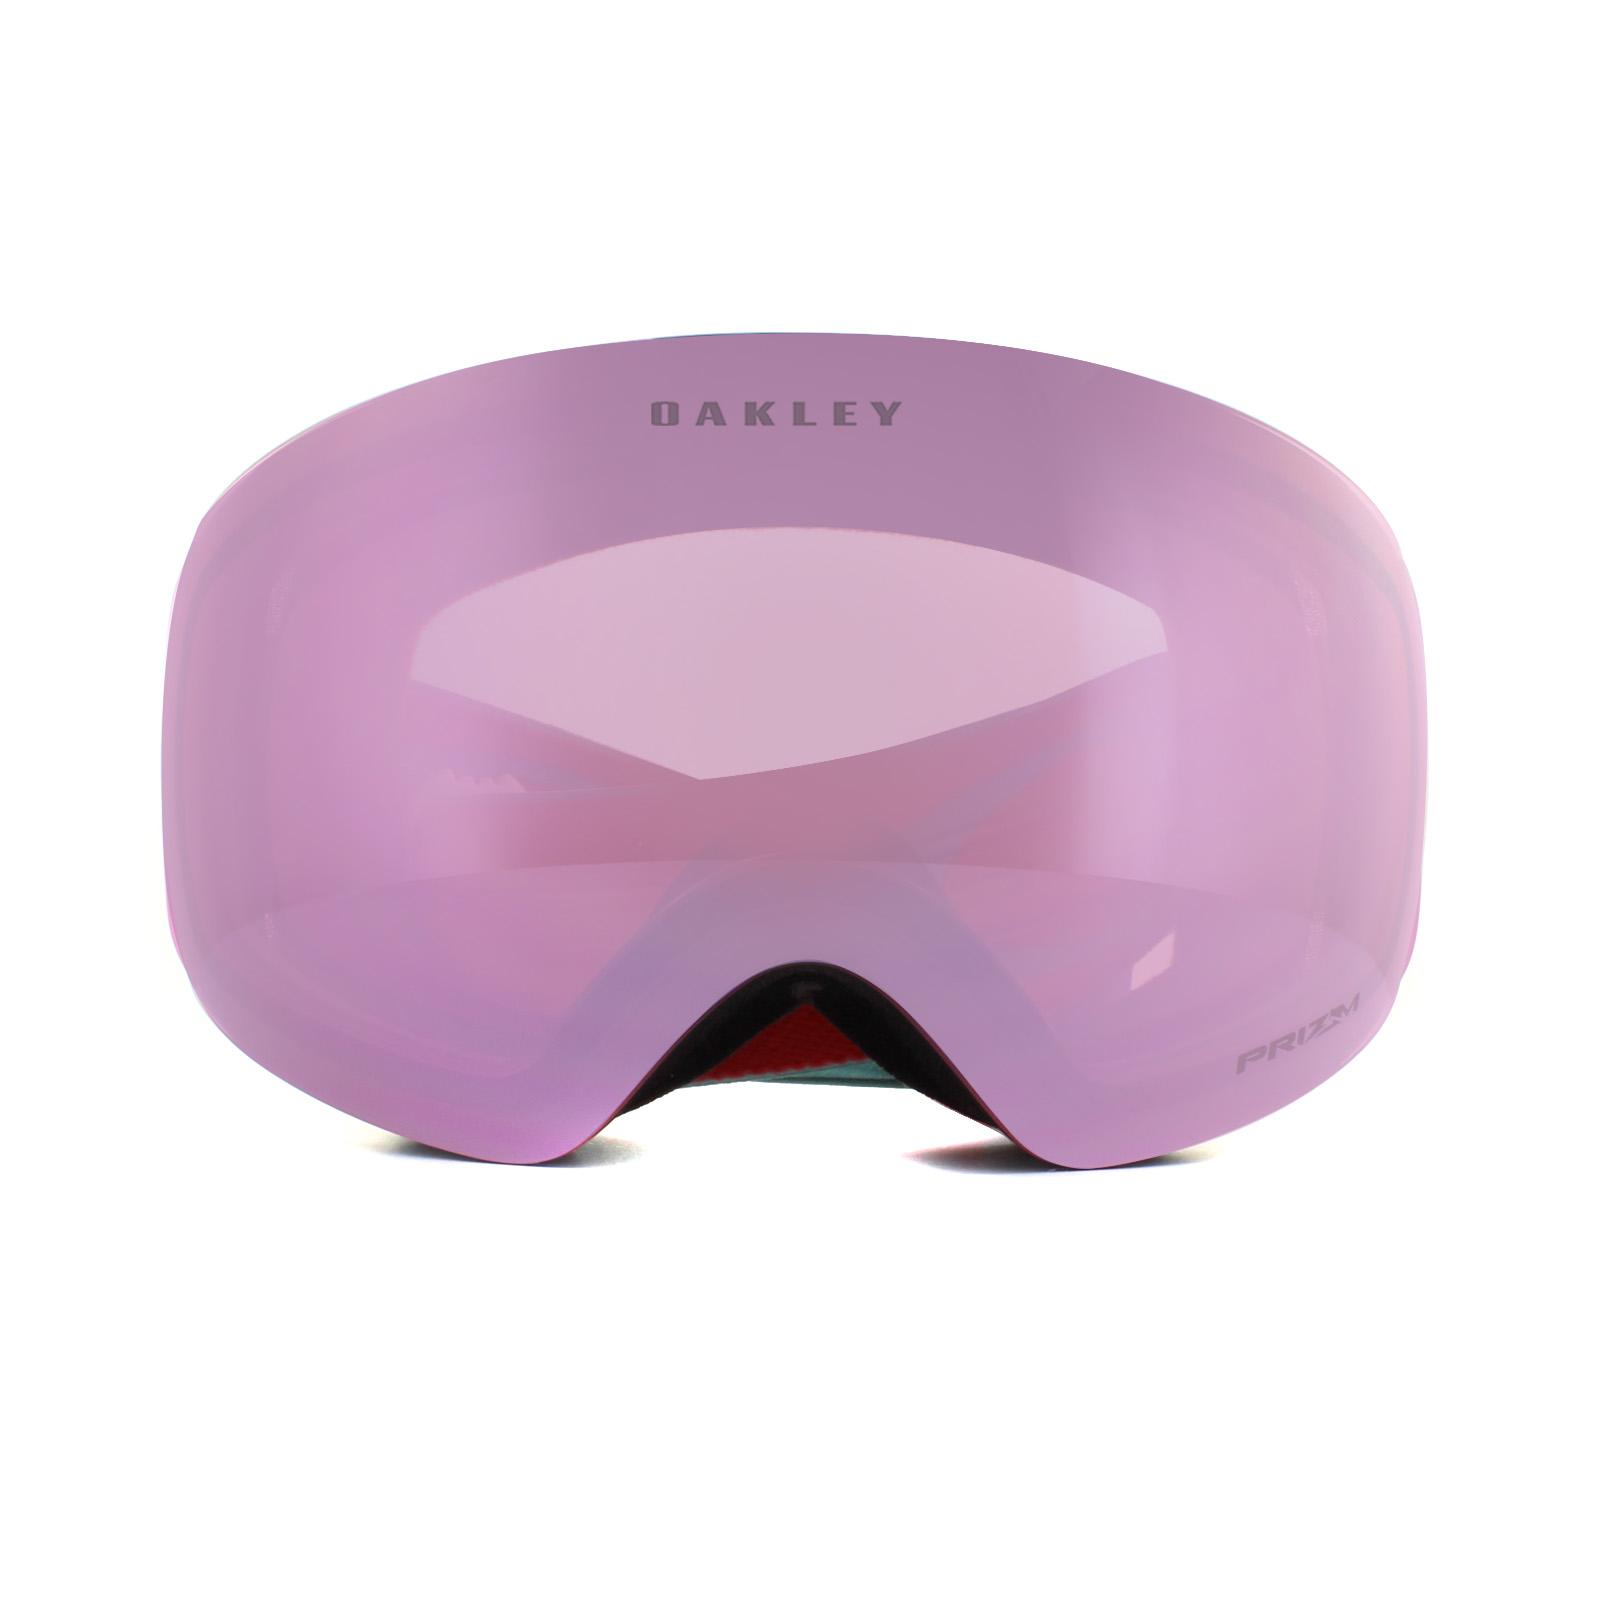 a9778372384 Sentinel Oakley Ski Goggles Flight Deck XM OO7064-77 Arctic Surf Coral Prizm  HI Pink Irid